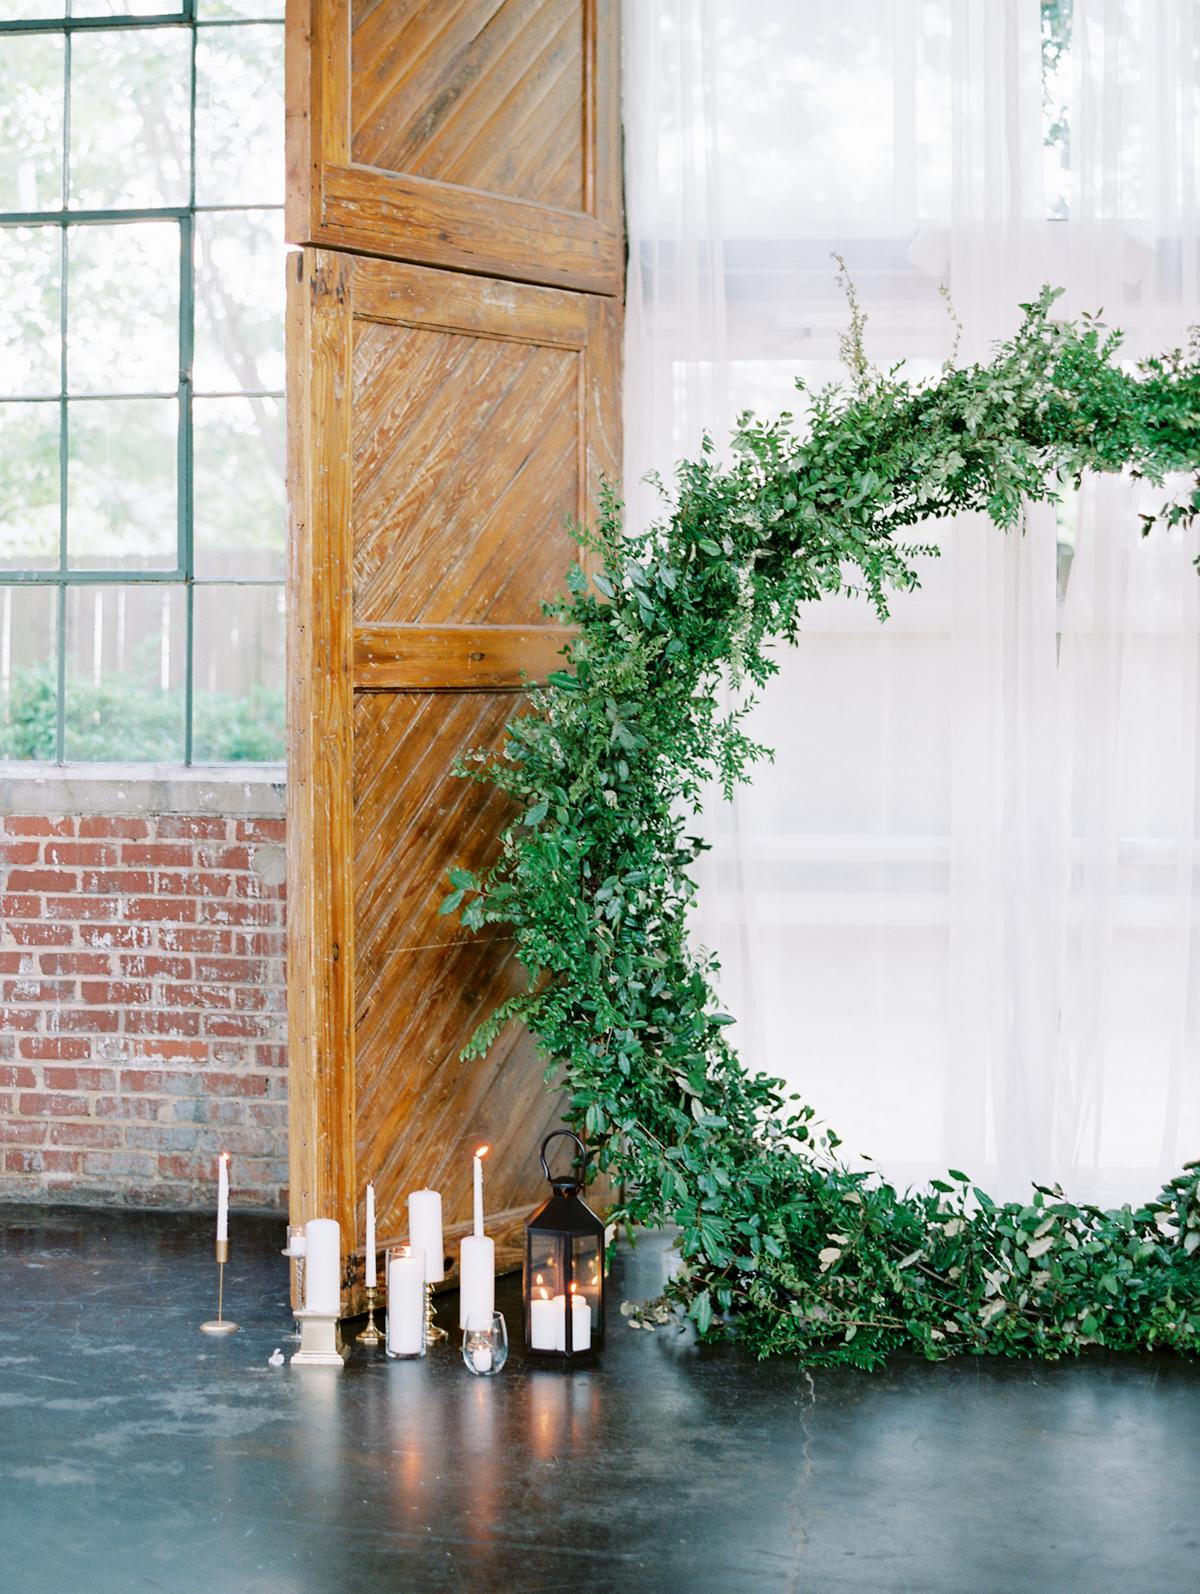 Foundry-At-Puritan-Mill-wedding-photos-venue-atlanta-fine-art-film-photographer30.JPG